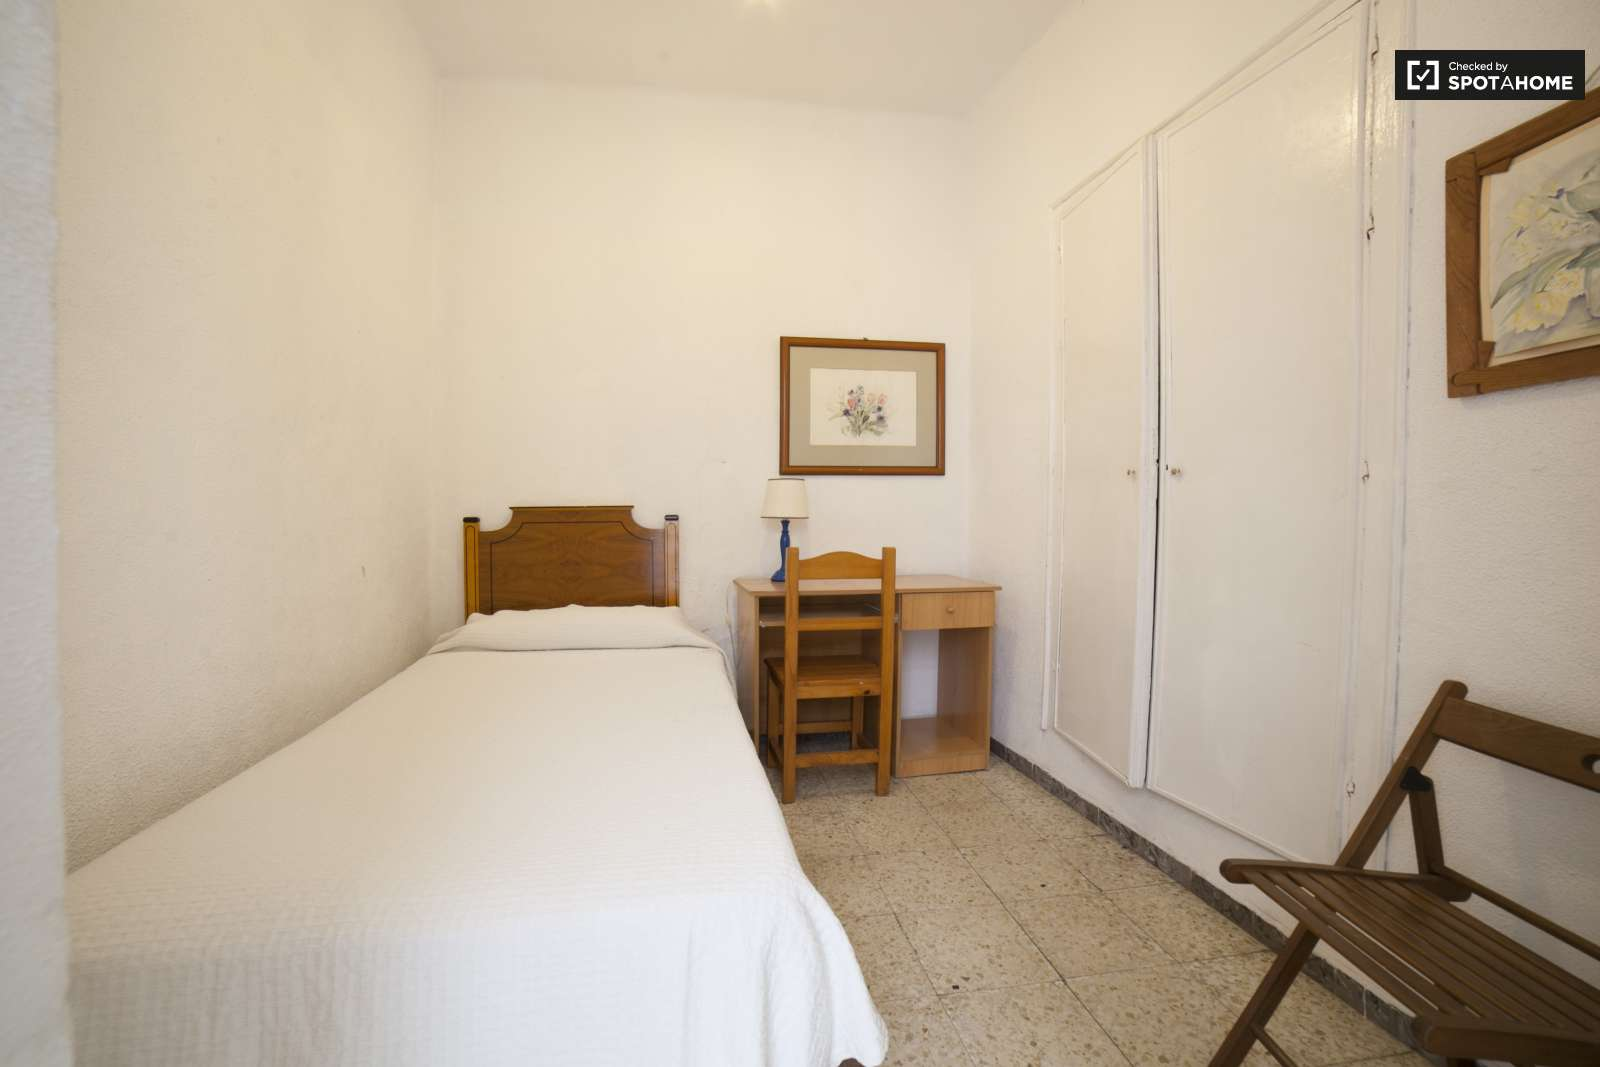 Bedroom 1D Furnished room with desk in